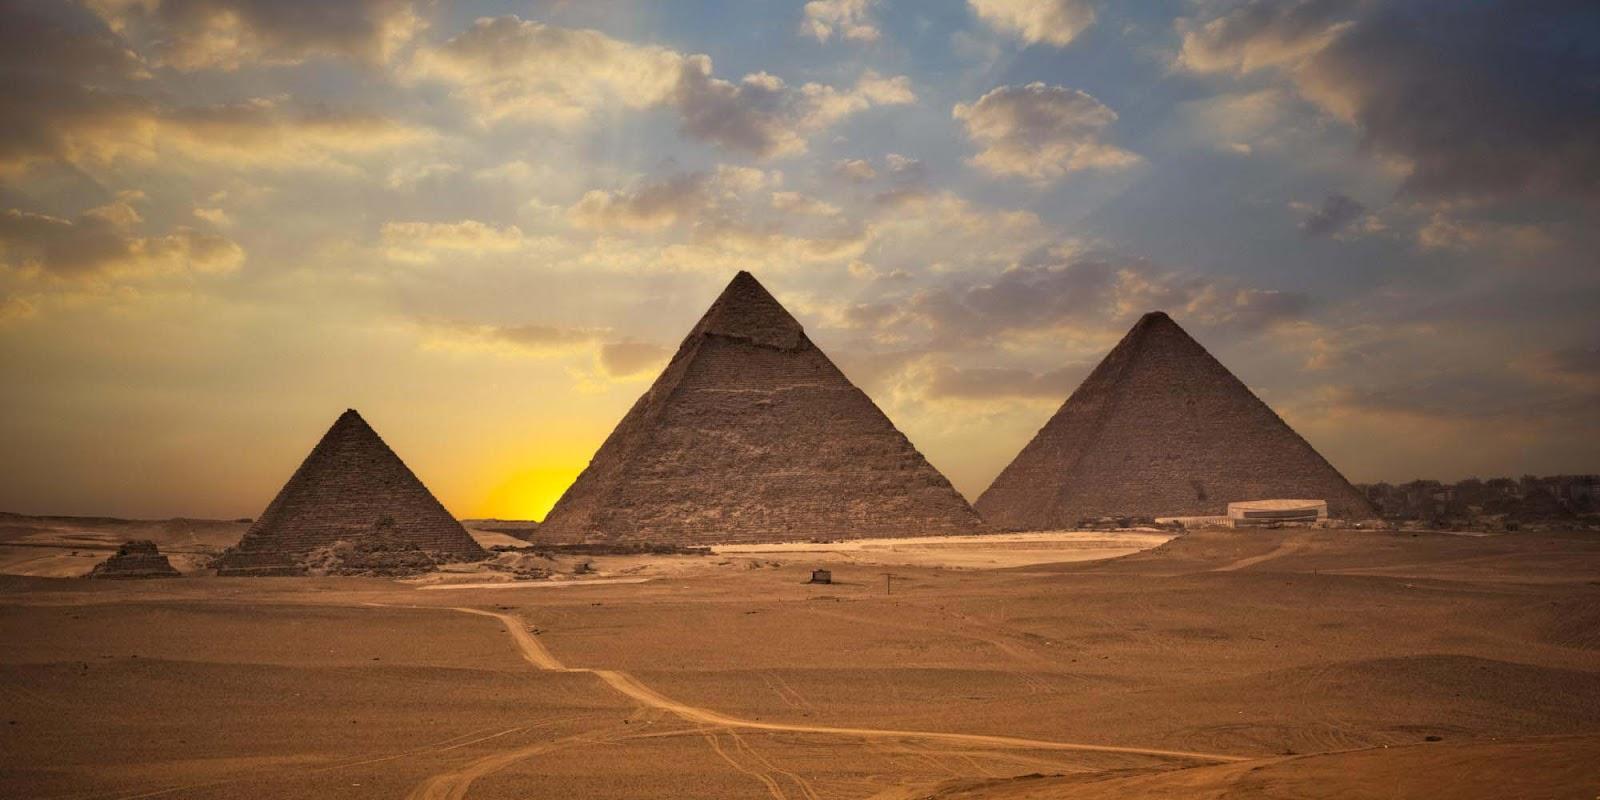 Paysage De L Egypte Fond D Ecran Pyramide Hd 1600x800 Wallpapertip